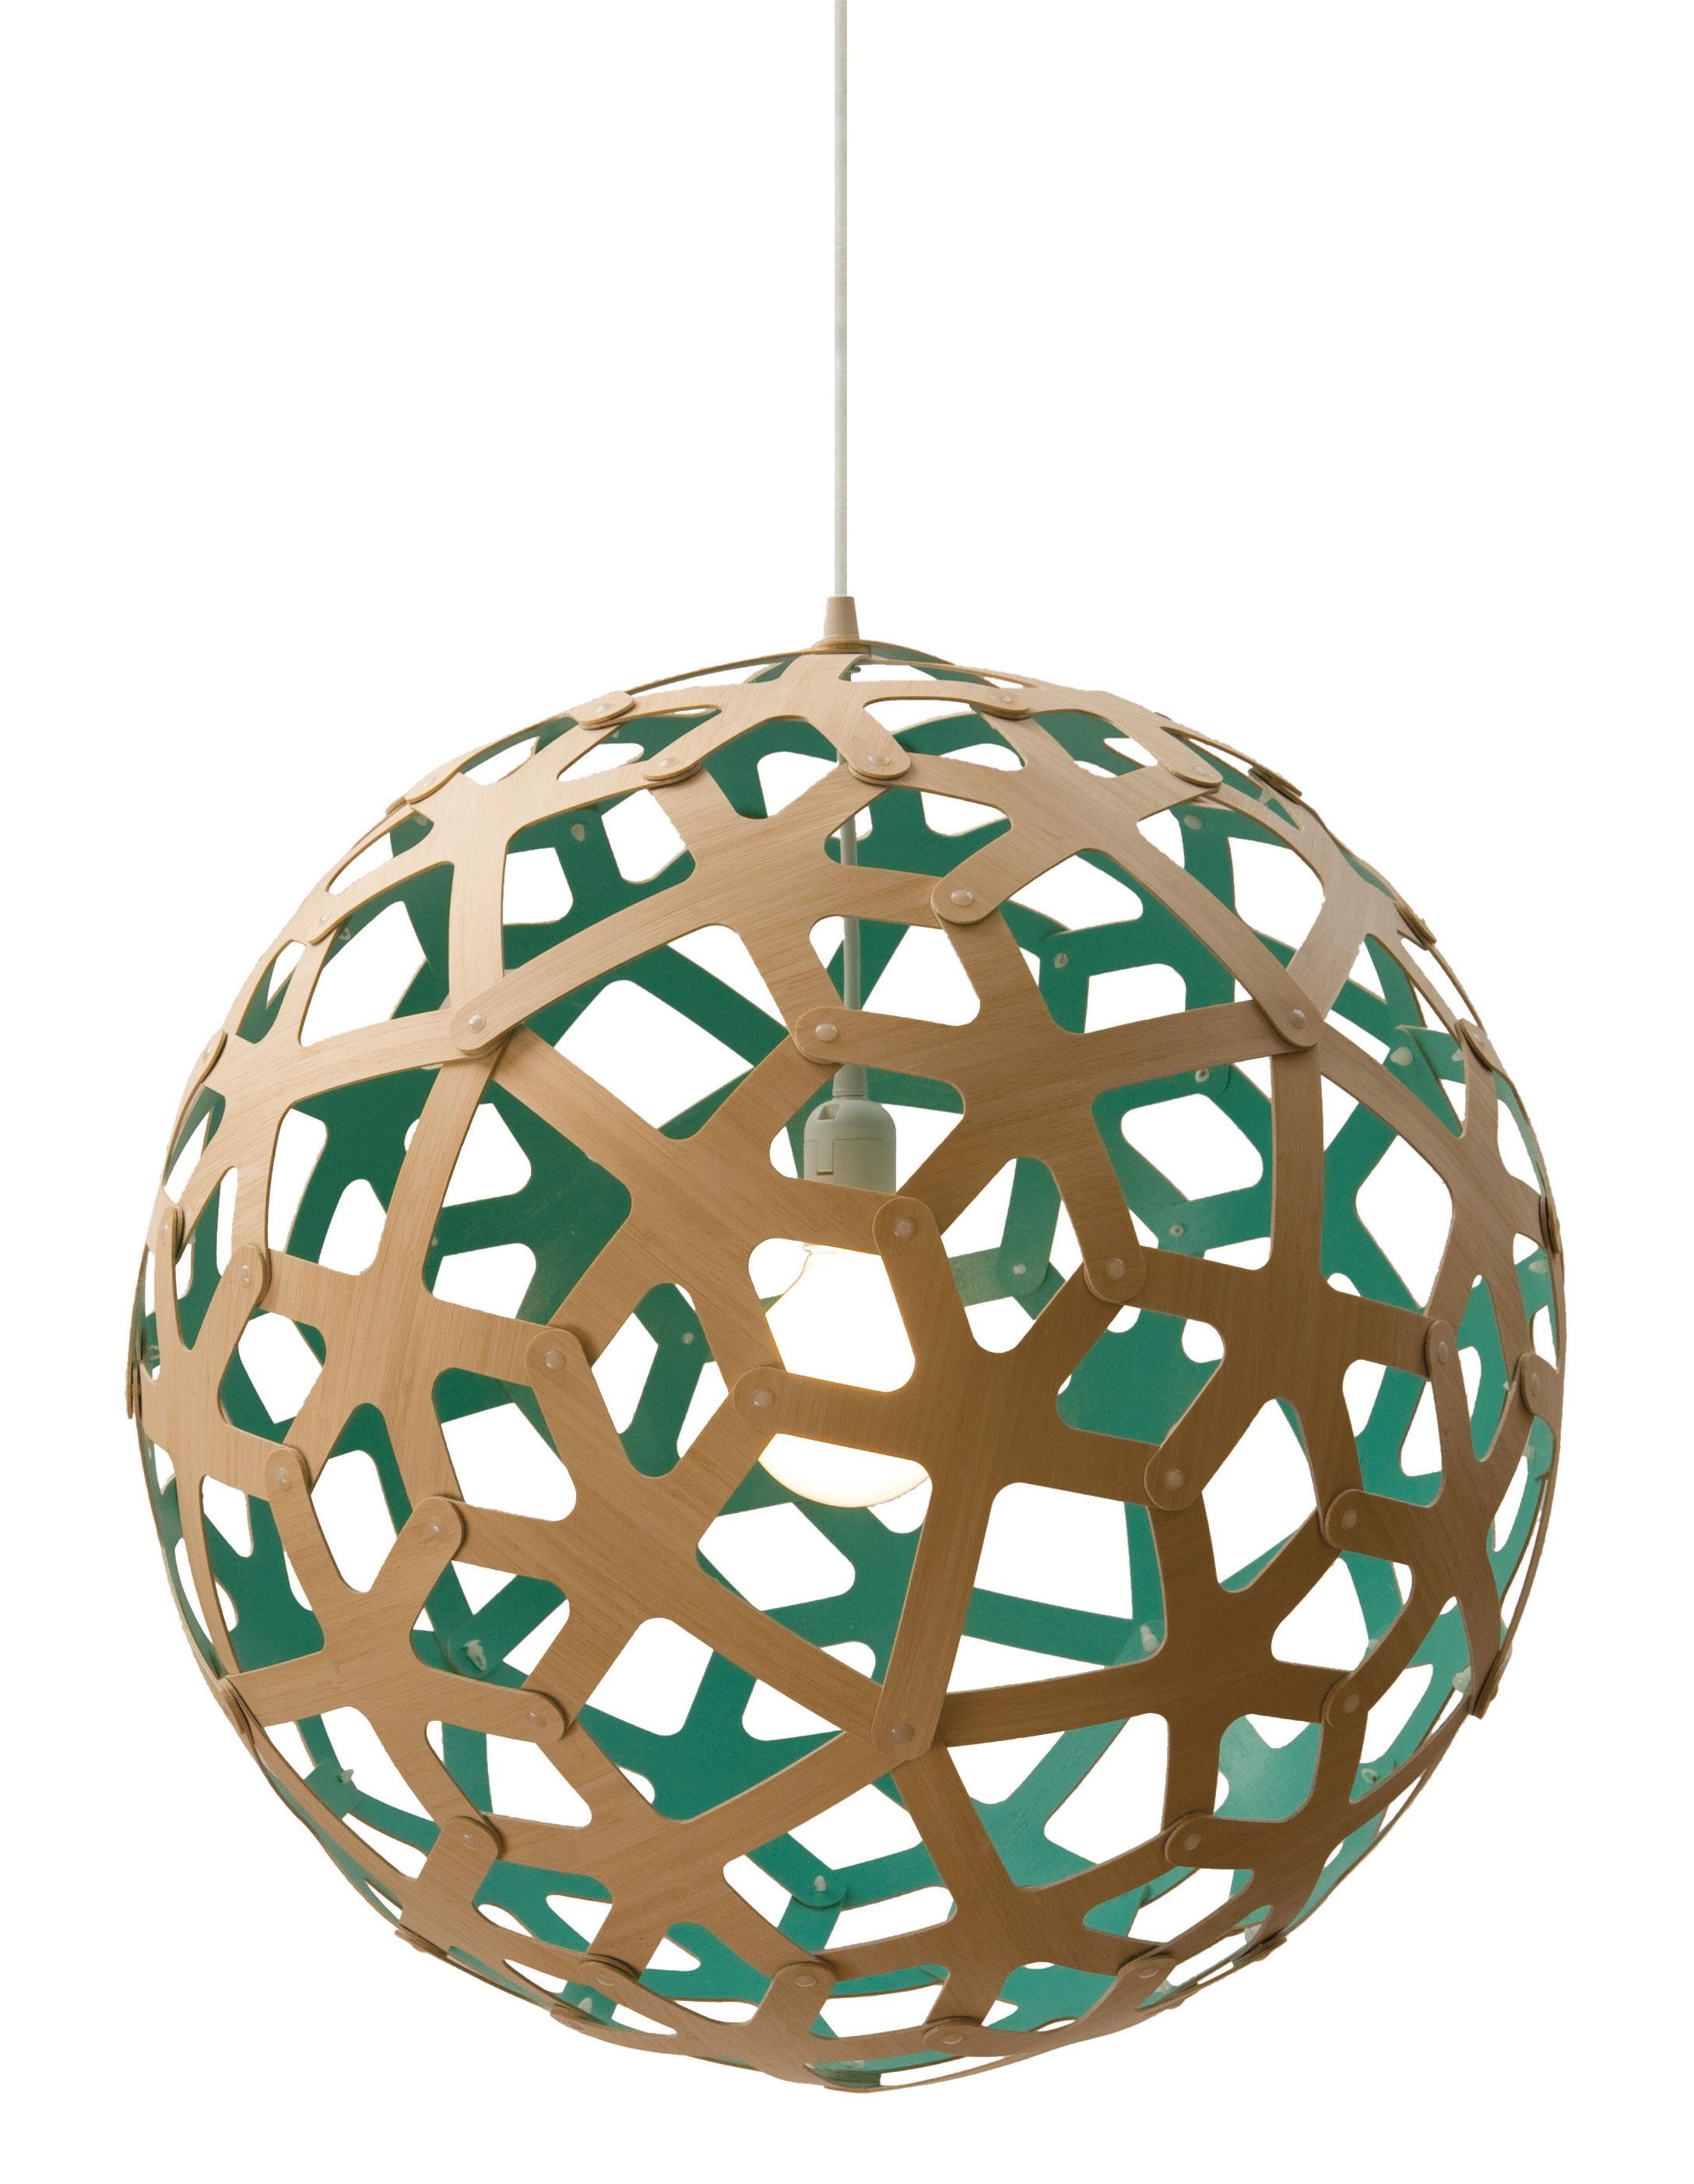 Lighting - Pendant Lighting - Coral Pendant - / Ø 40 cm - Two-coloured by David Trubridge - Aqua blue/ natural wood - Pine